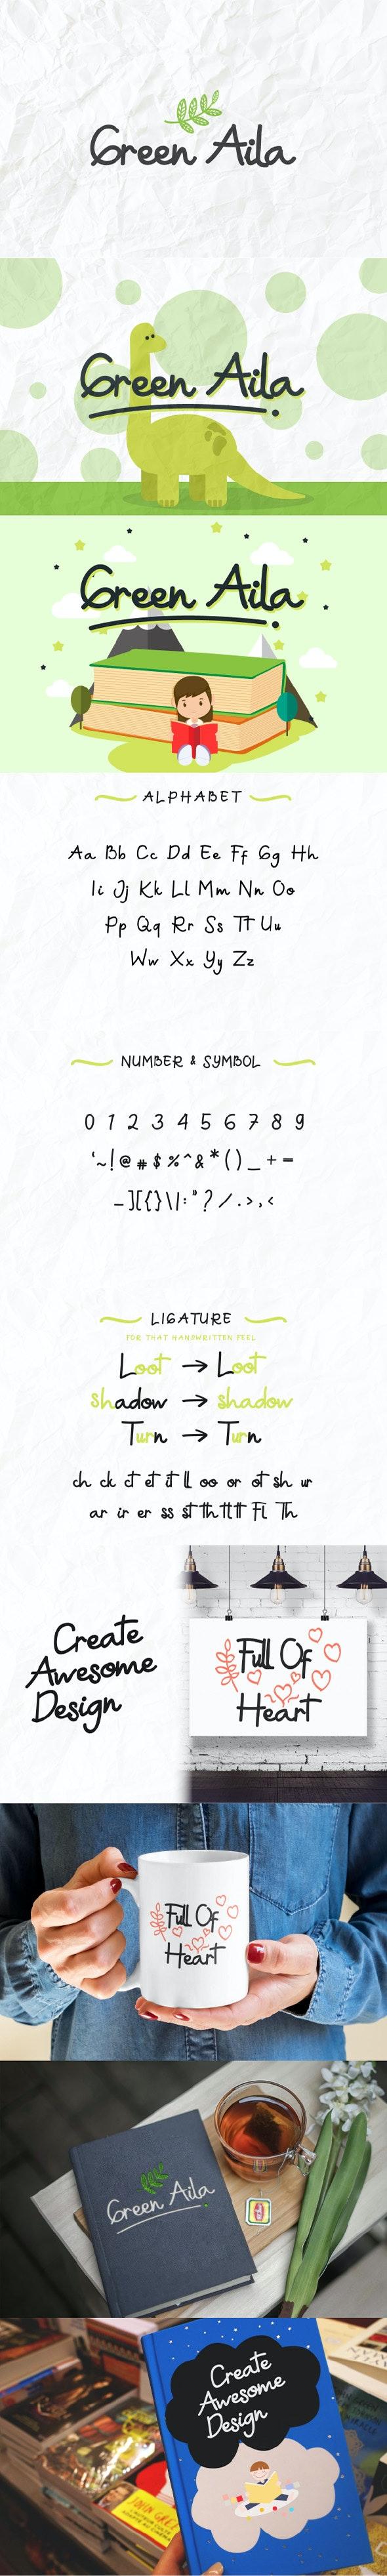 Green Aila Cute Comic Handwriting - Comic Decorative